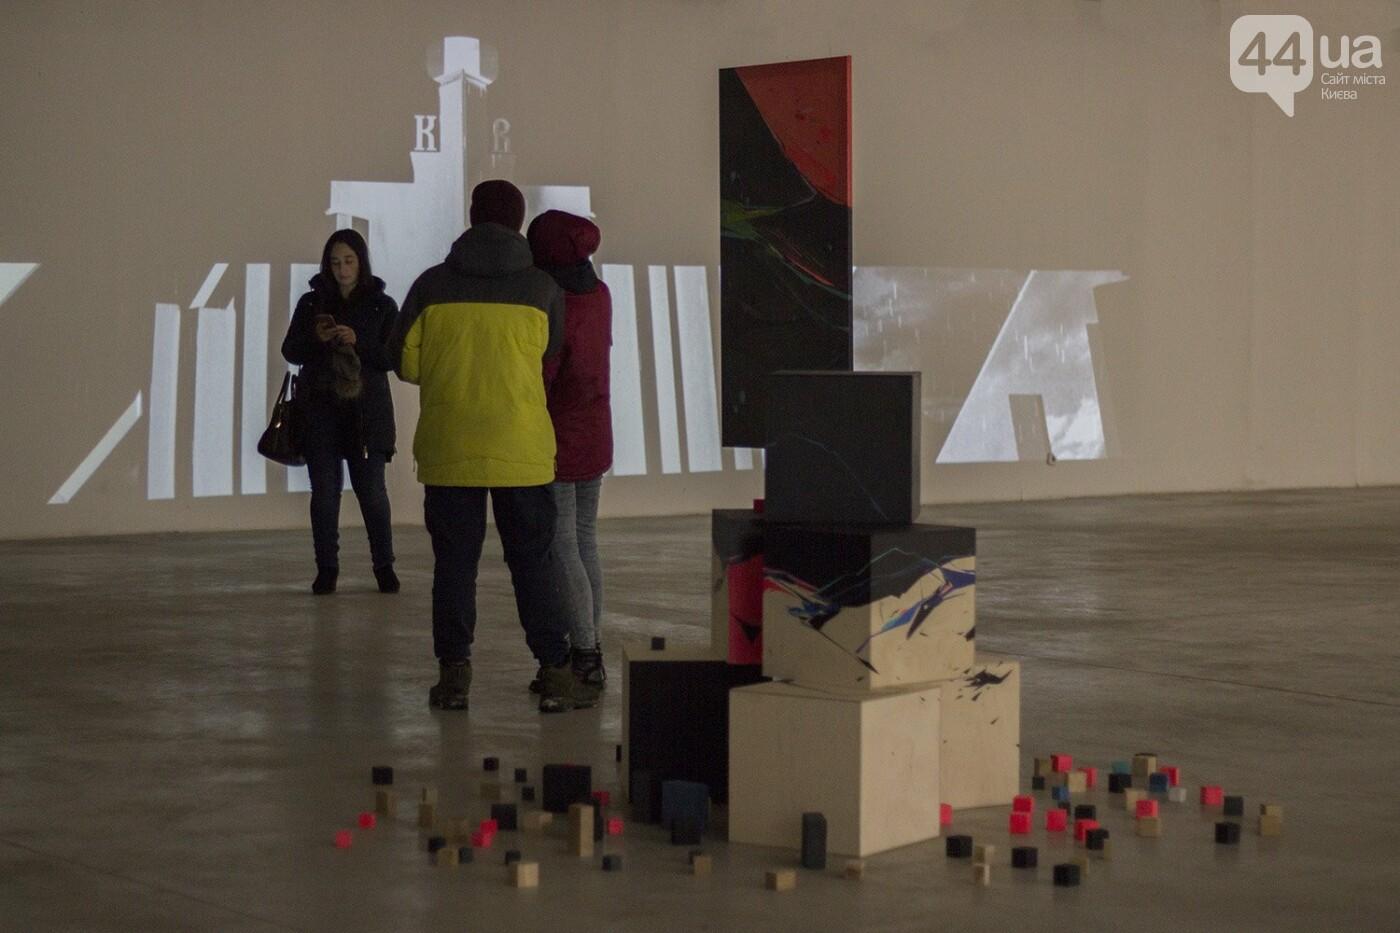 В центре Киева показали 3D-шоу , фото-8